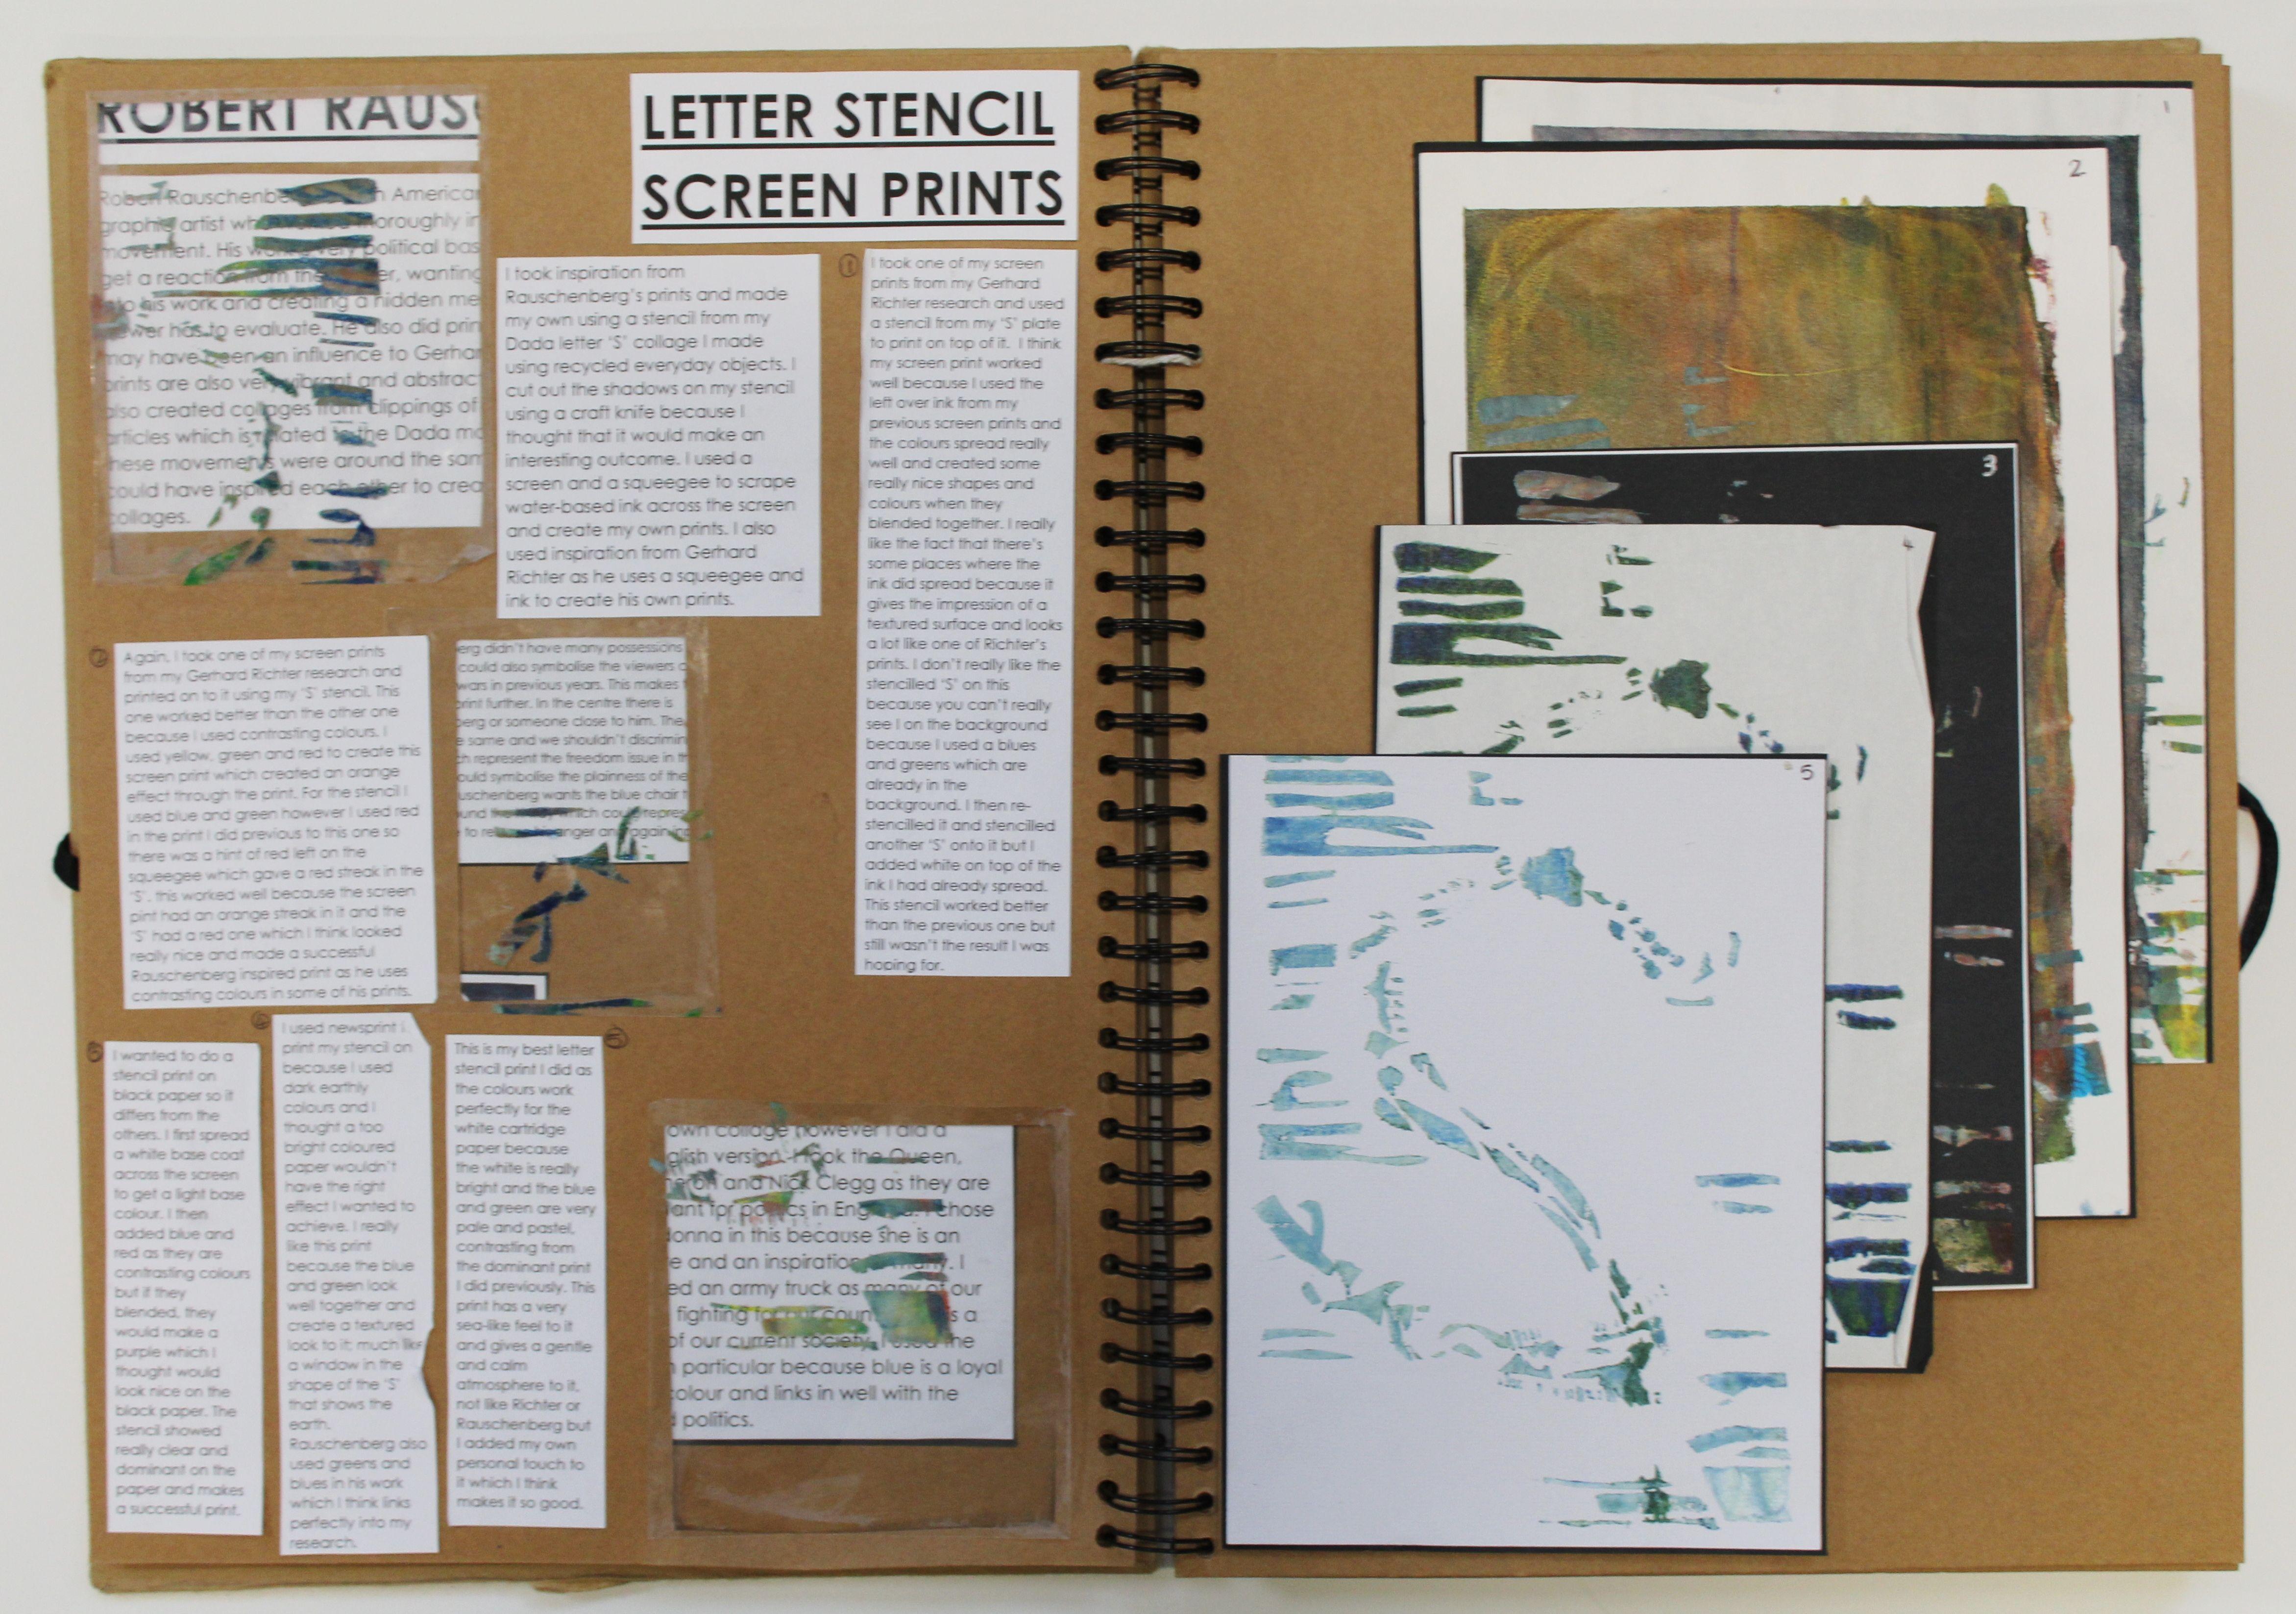 As Graphic Communication A3 Brown Sketchbook Screen Prints Esa Theme Relationships Thomas Rotherham C Sketch Book Photography Sketchbook Graphic Design Art